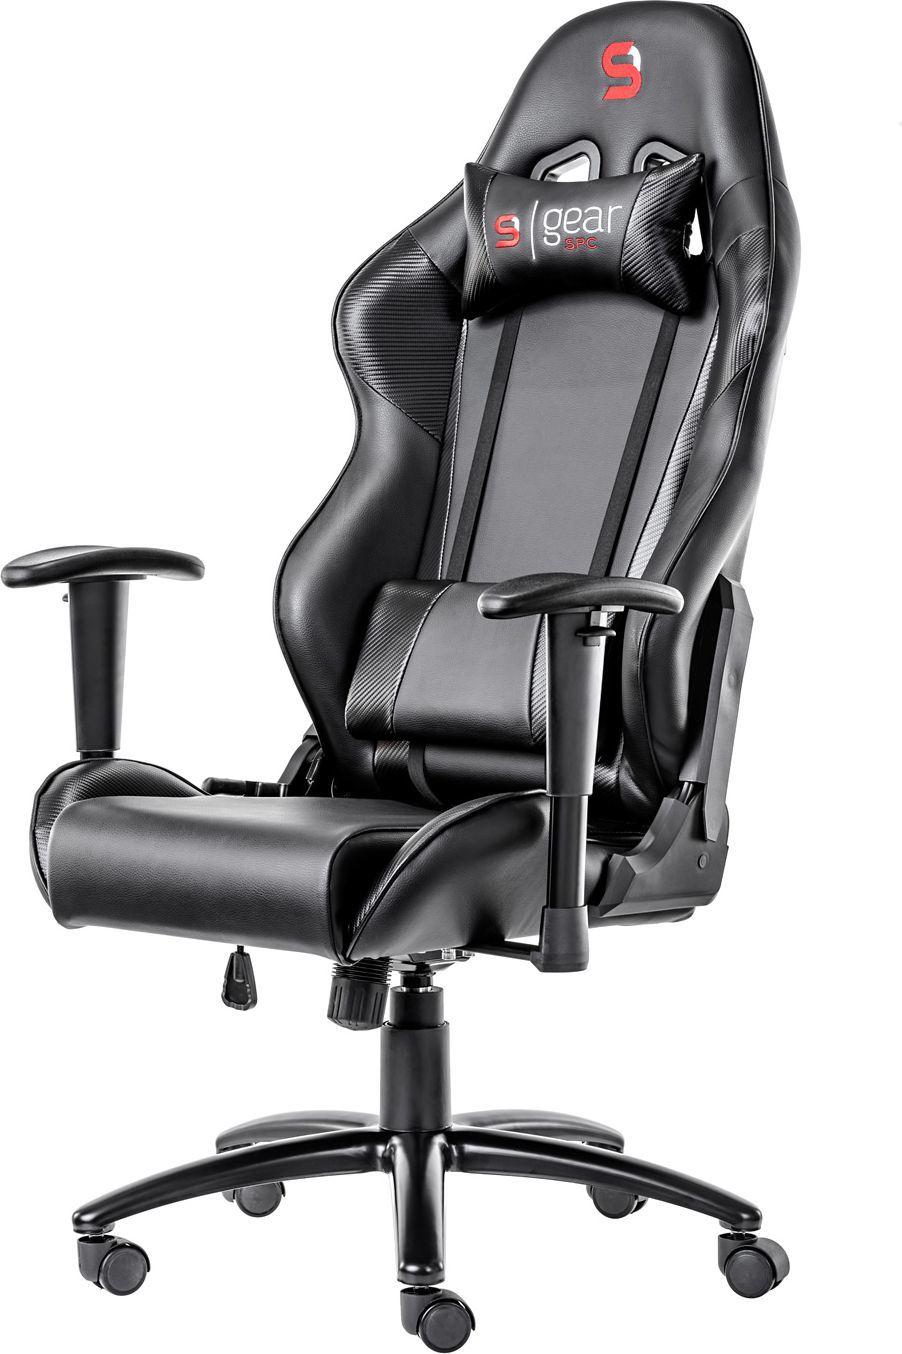 Fotel SPC Gear SR300 Black (SR300BK) 1